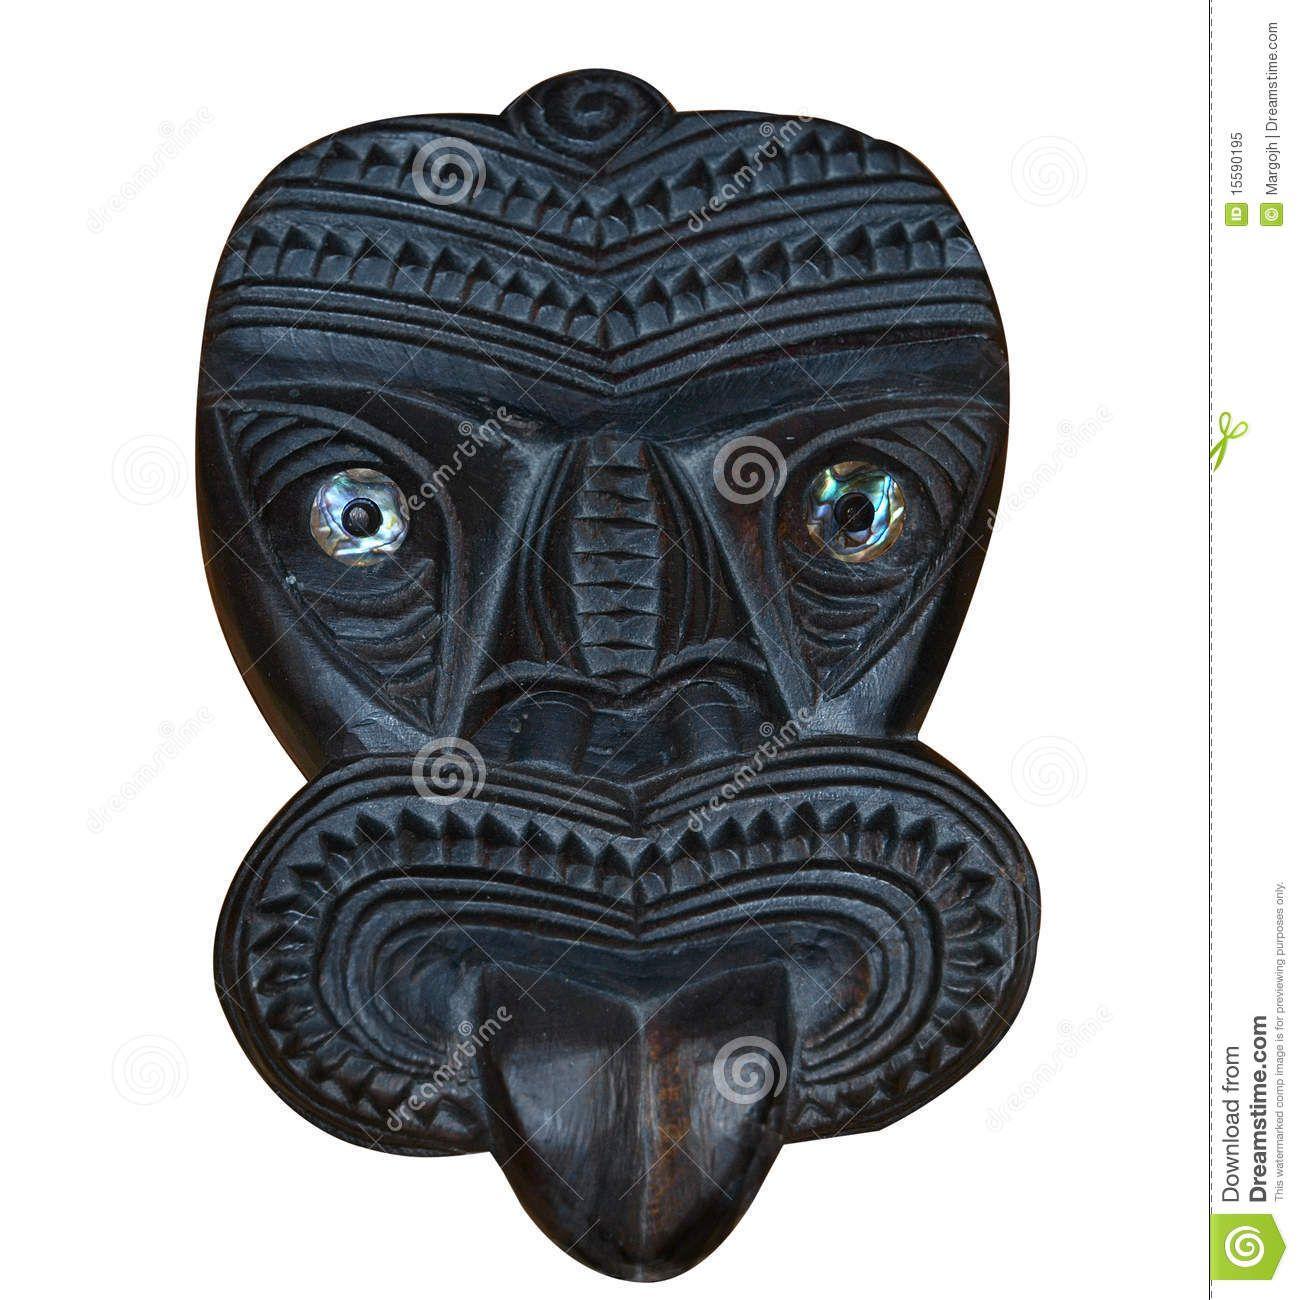 tribal face masks | Maori Wood Carved Tiki Mask Royalty Free Stock Photo - Image: 15590195